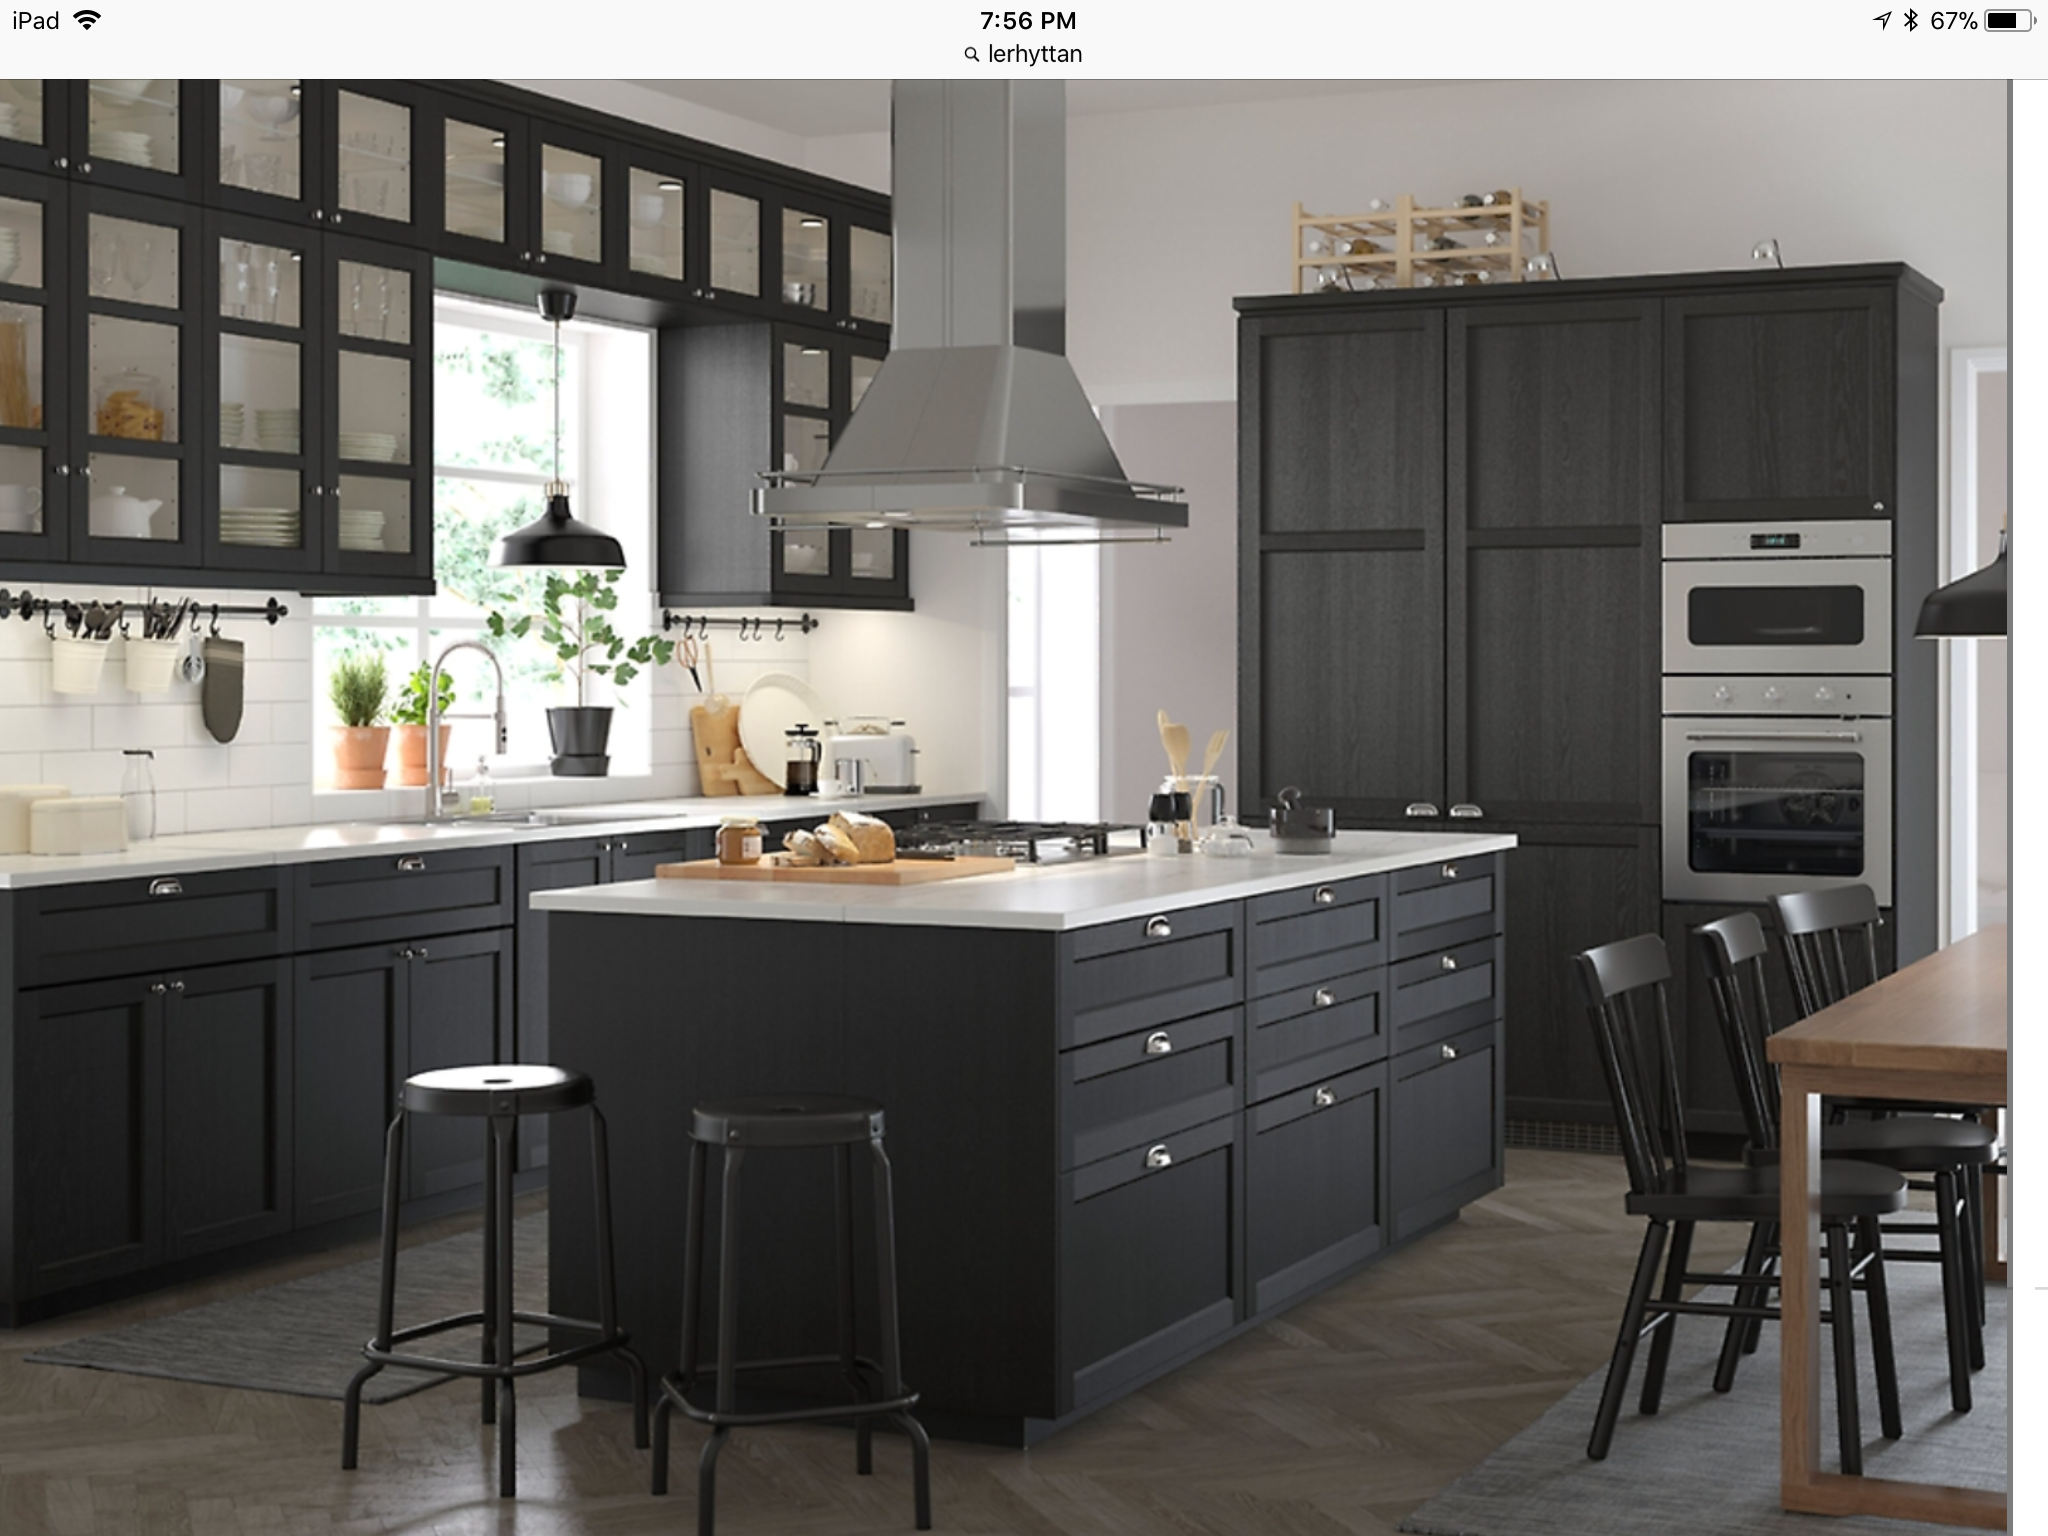 Lerhyttan Ikea Ikea Kitchen Inspiration Kitchen Design Kitchen Inspirations